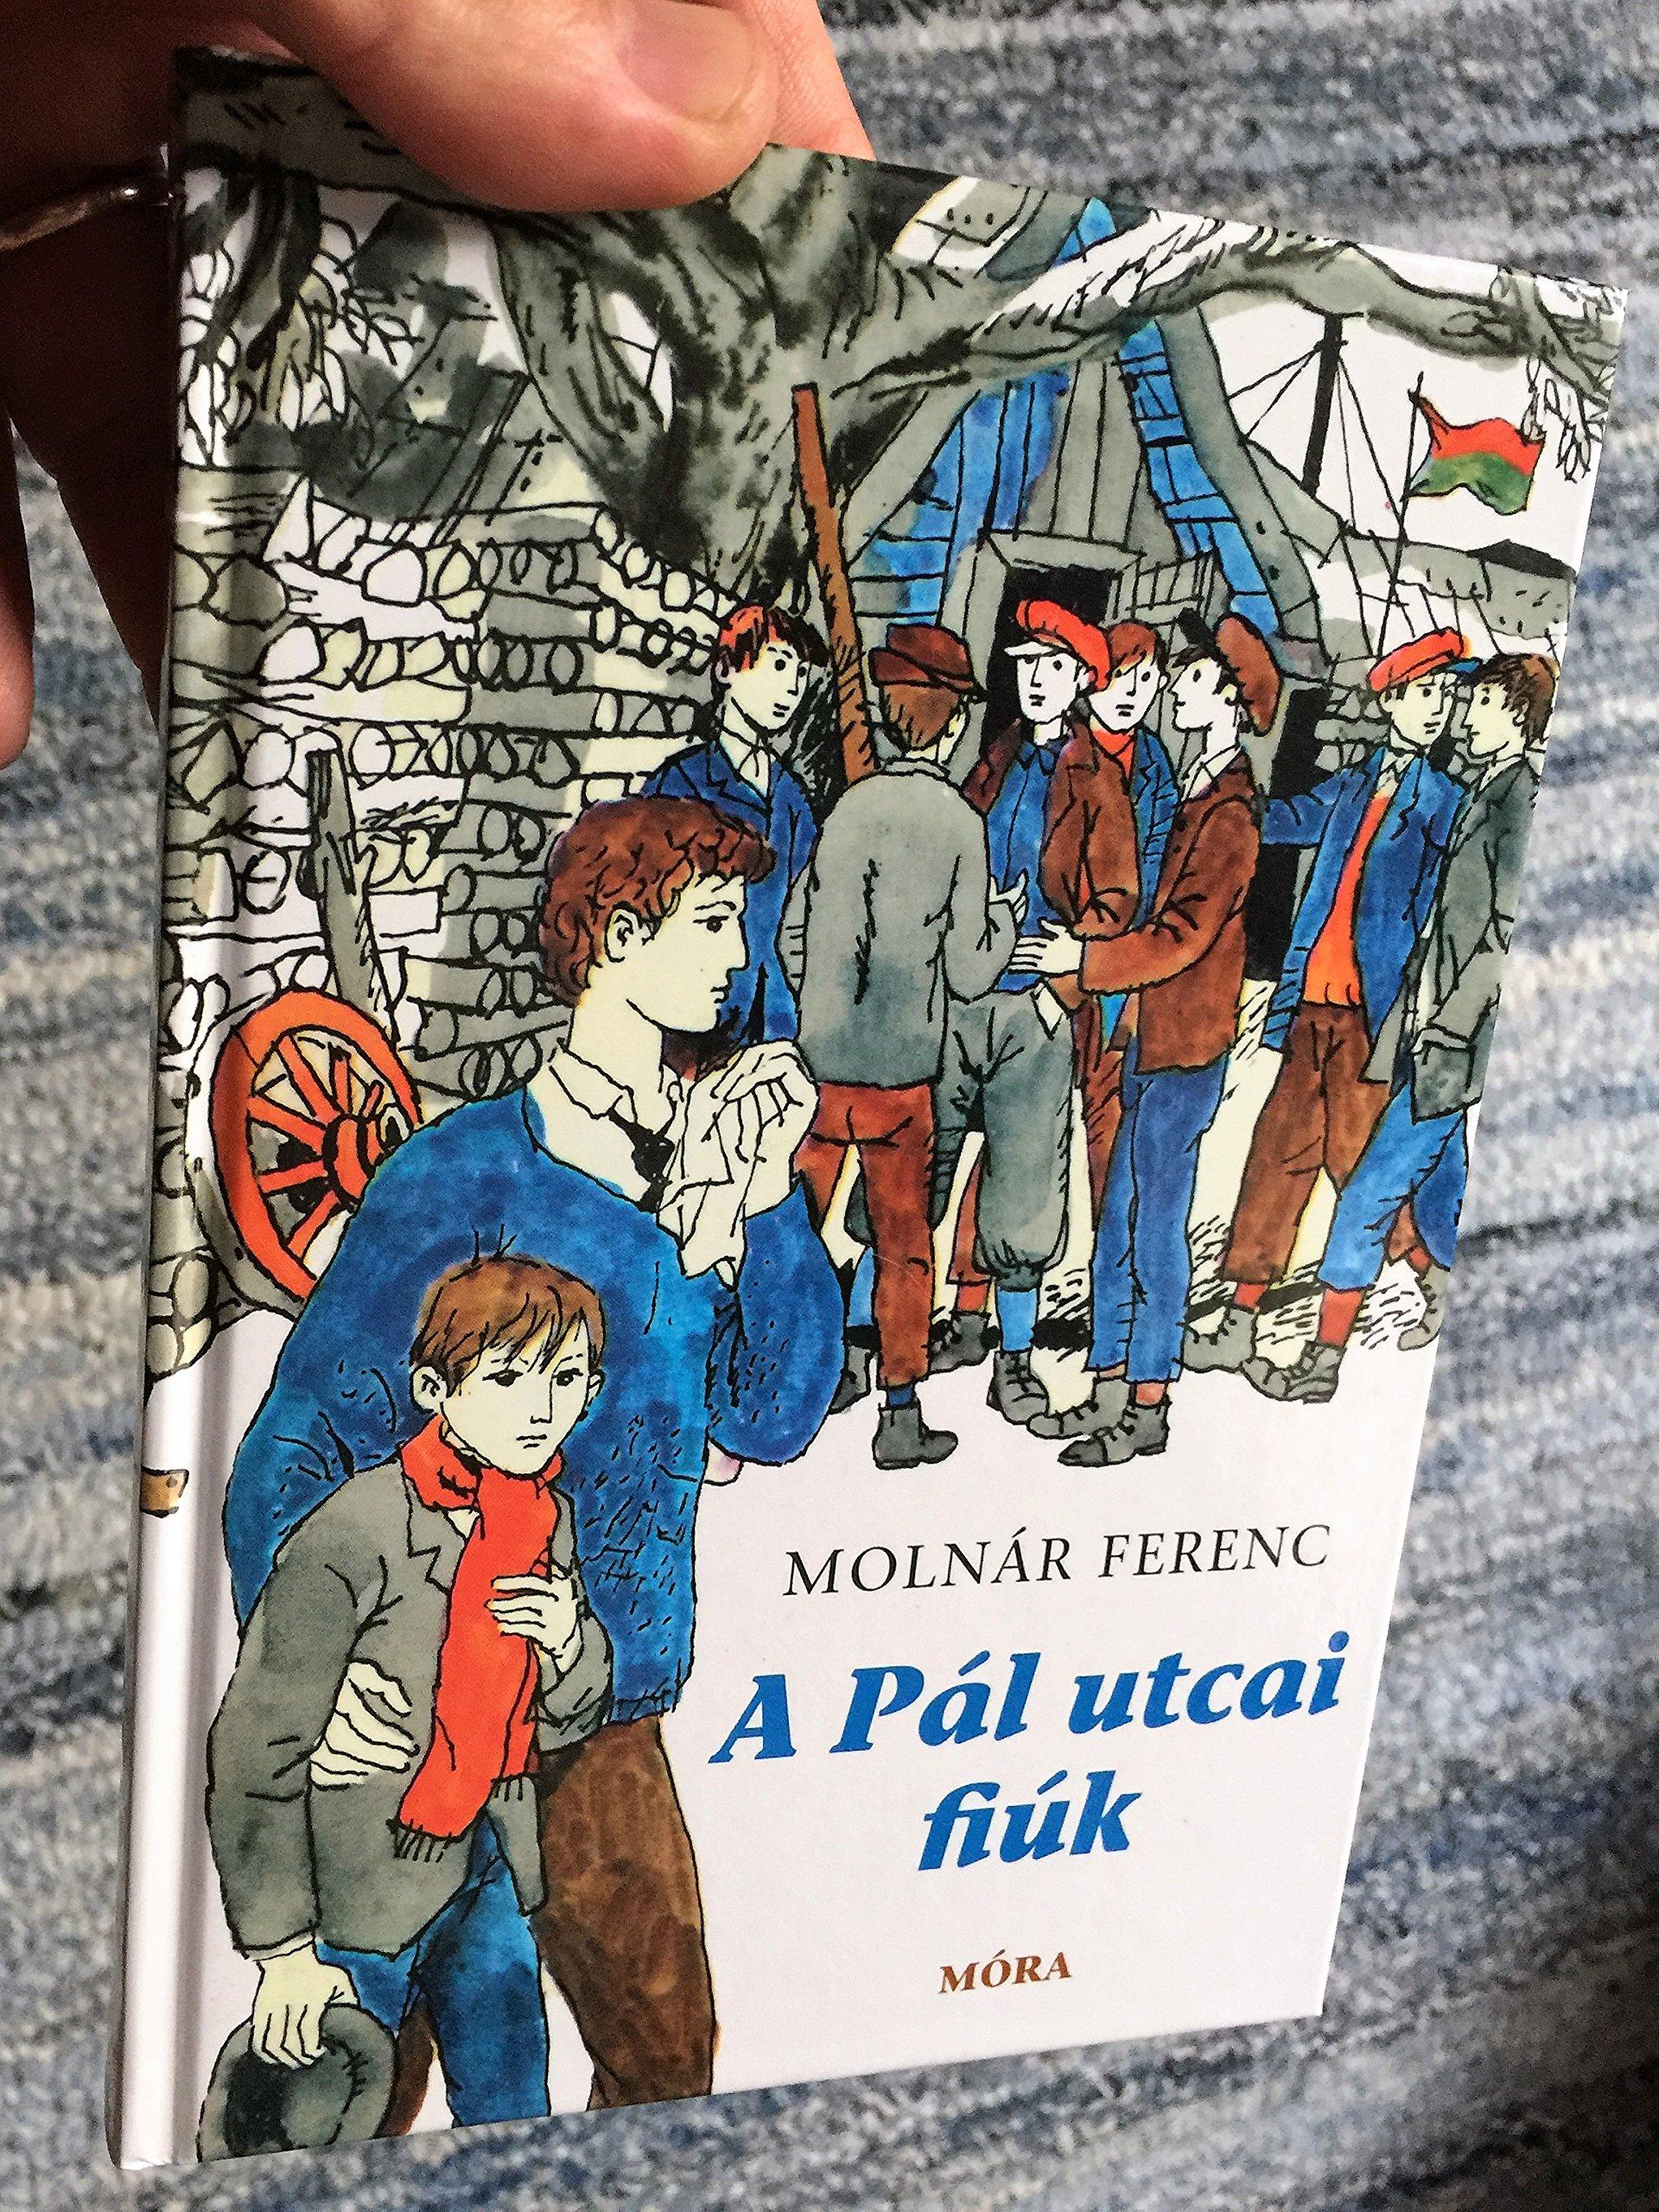 A PAL UTCAI FIUK Molnar Ferenc 9789631188707 Amazon Books